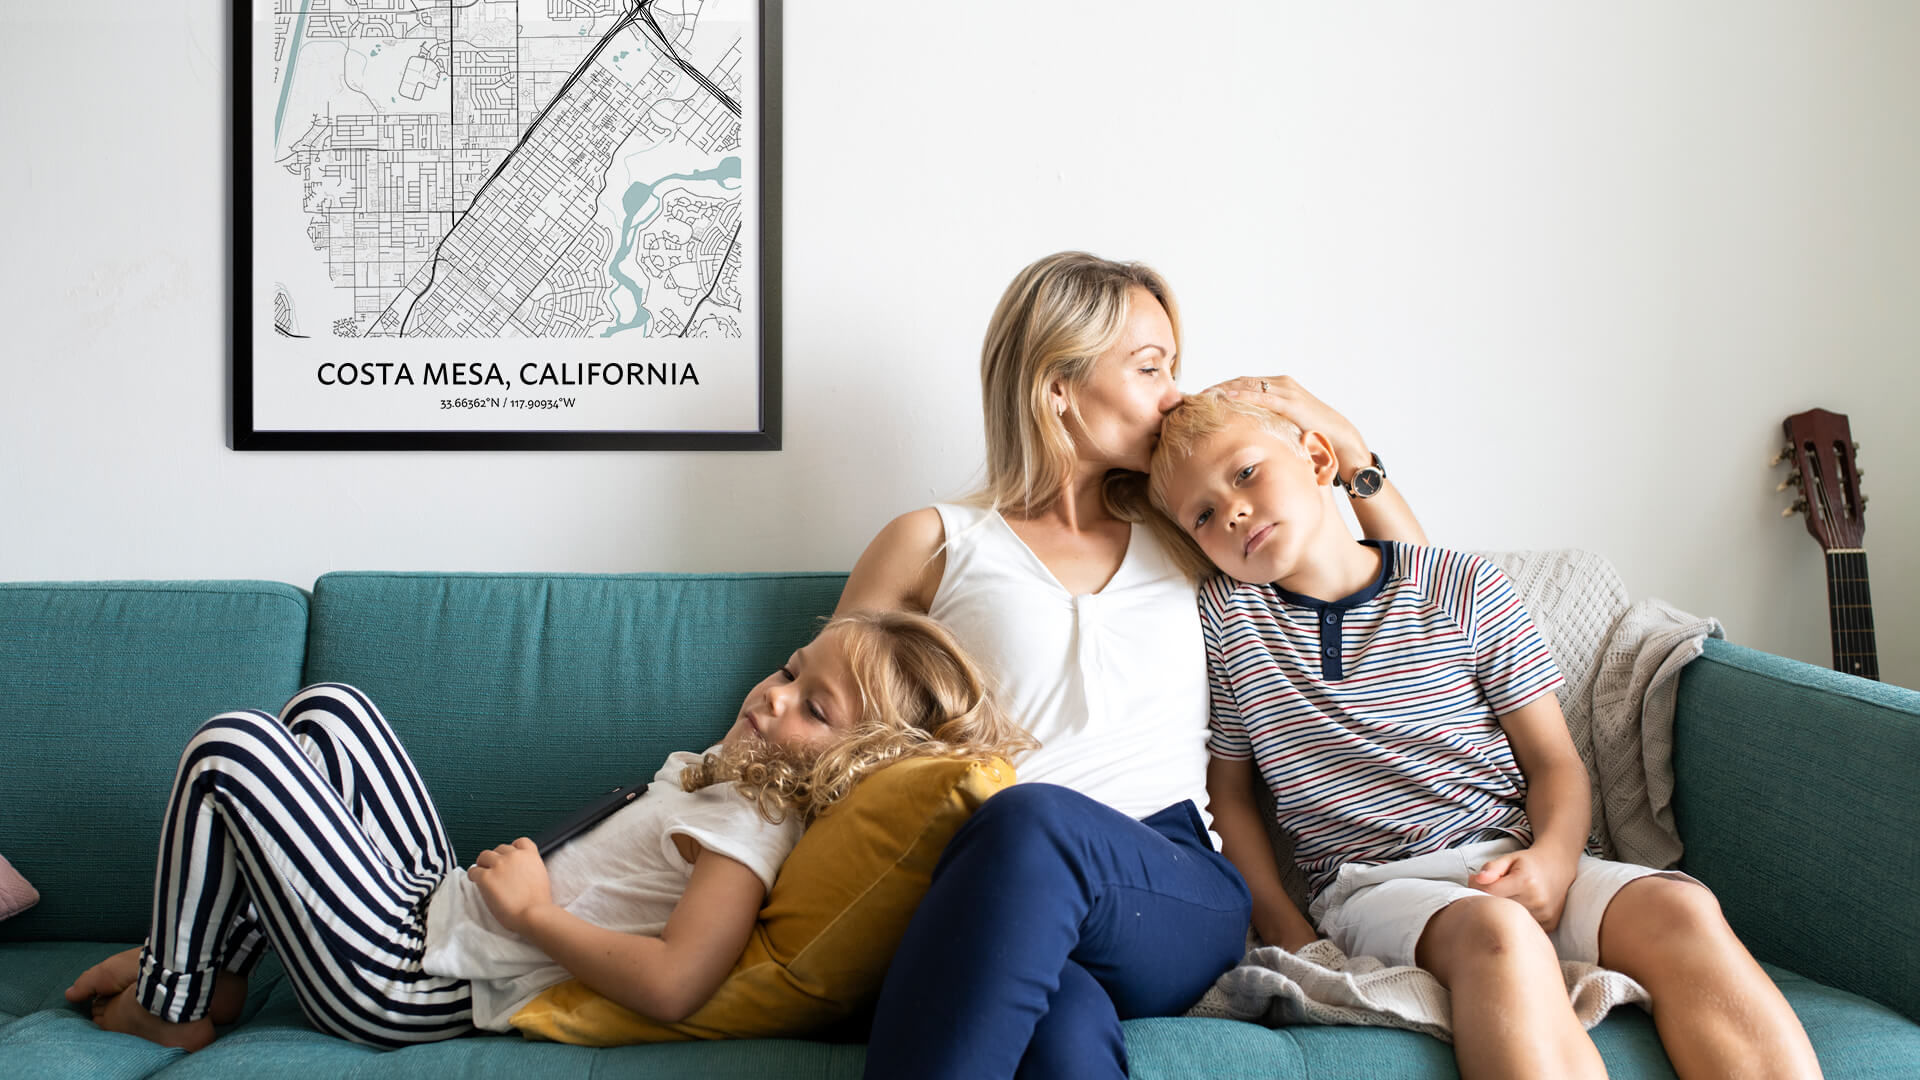 Costa Mesa map poster